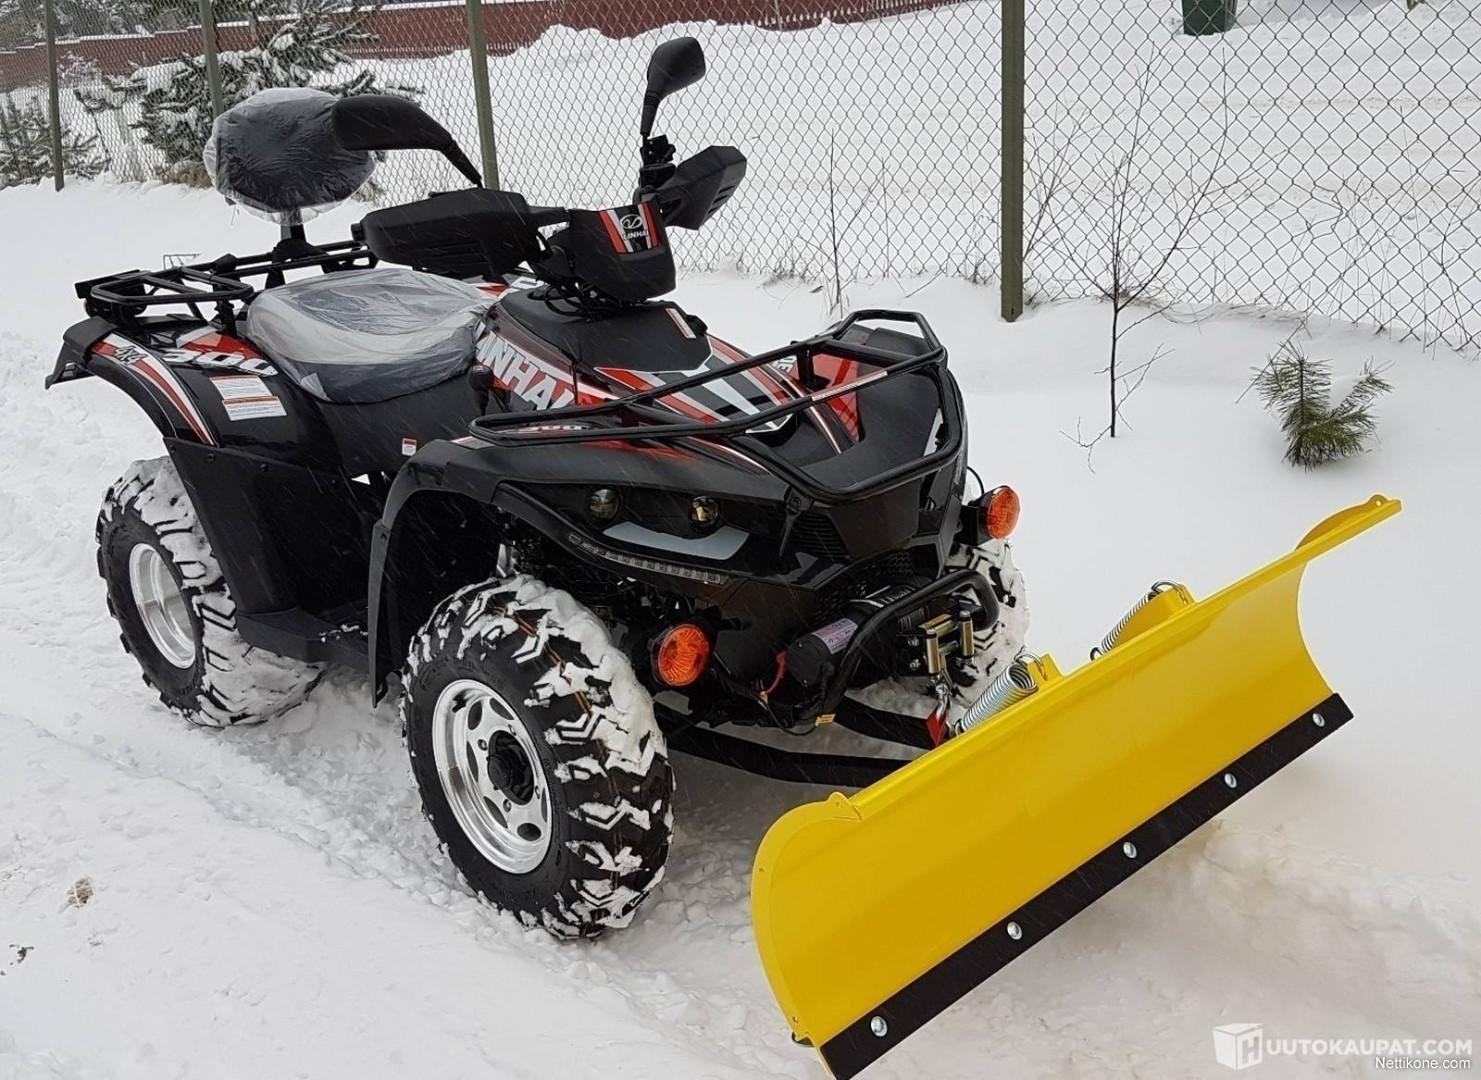 Linhai 300 4x4 T3B traktorimönkijä tractors, 2019 - Nettikone